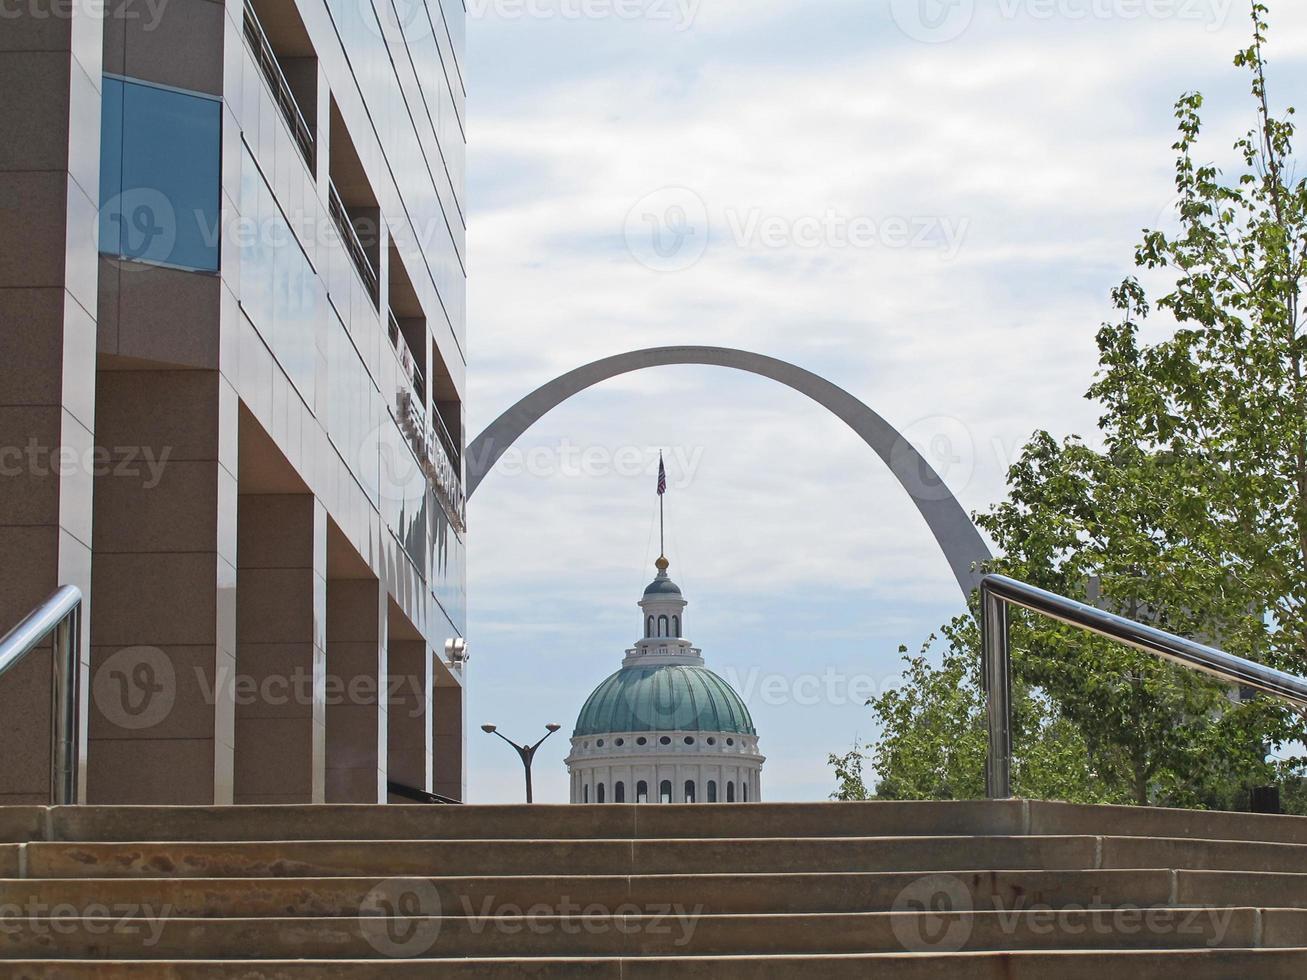 båge och huvudstadsbyggnad i centrala St. louis foto